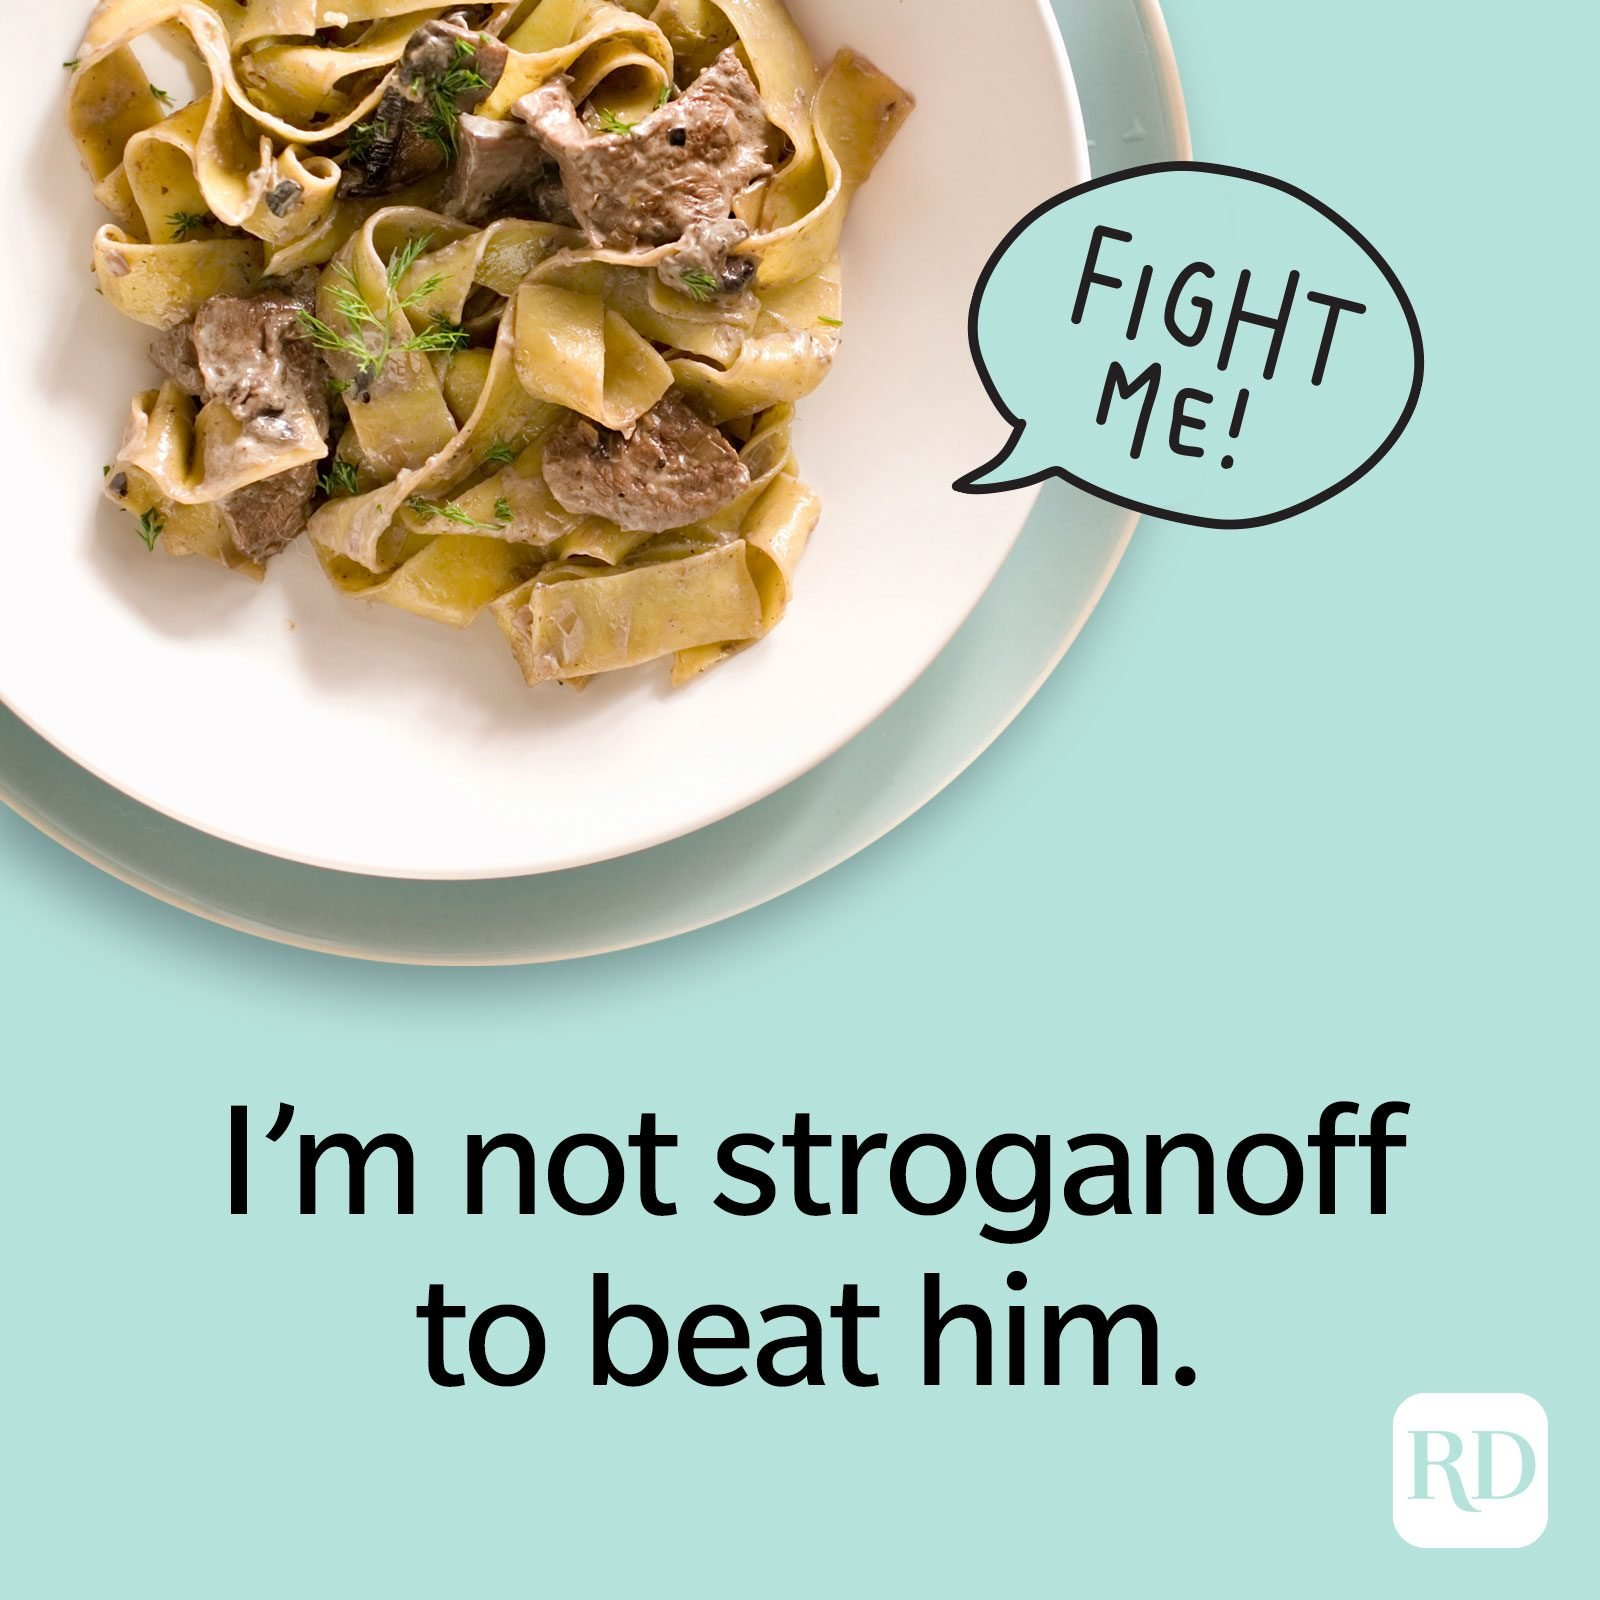 I'm not stroganoff to beat him.